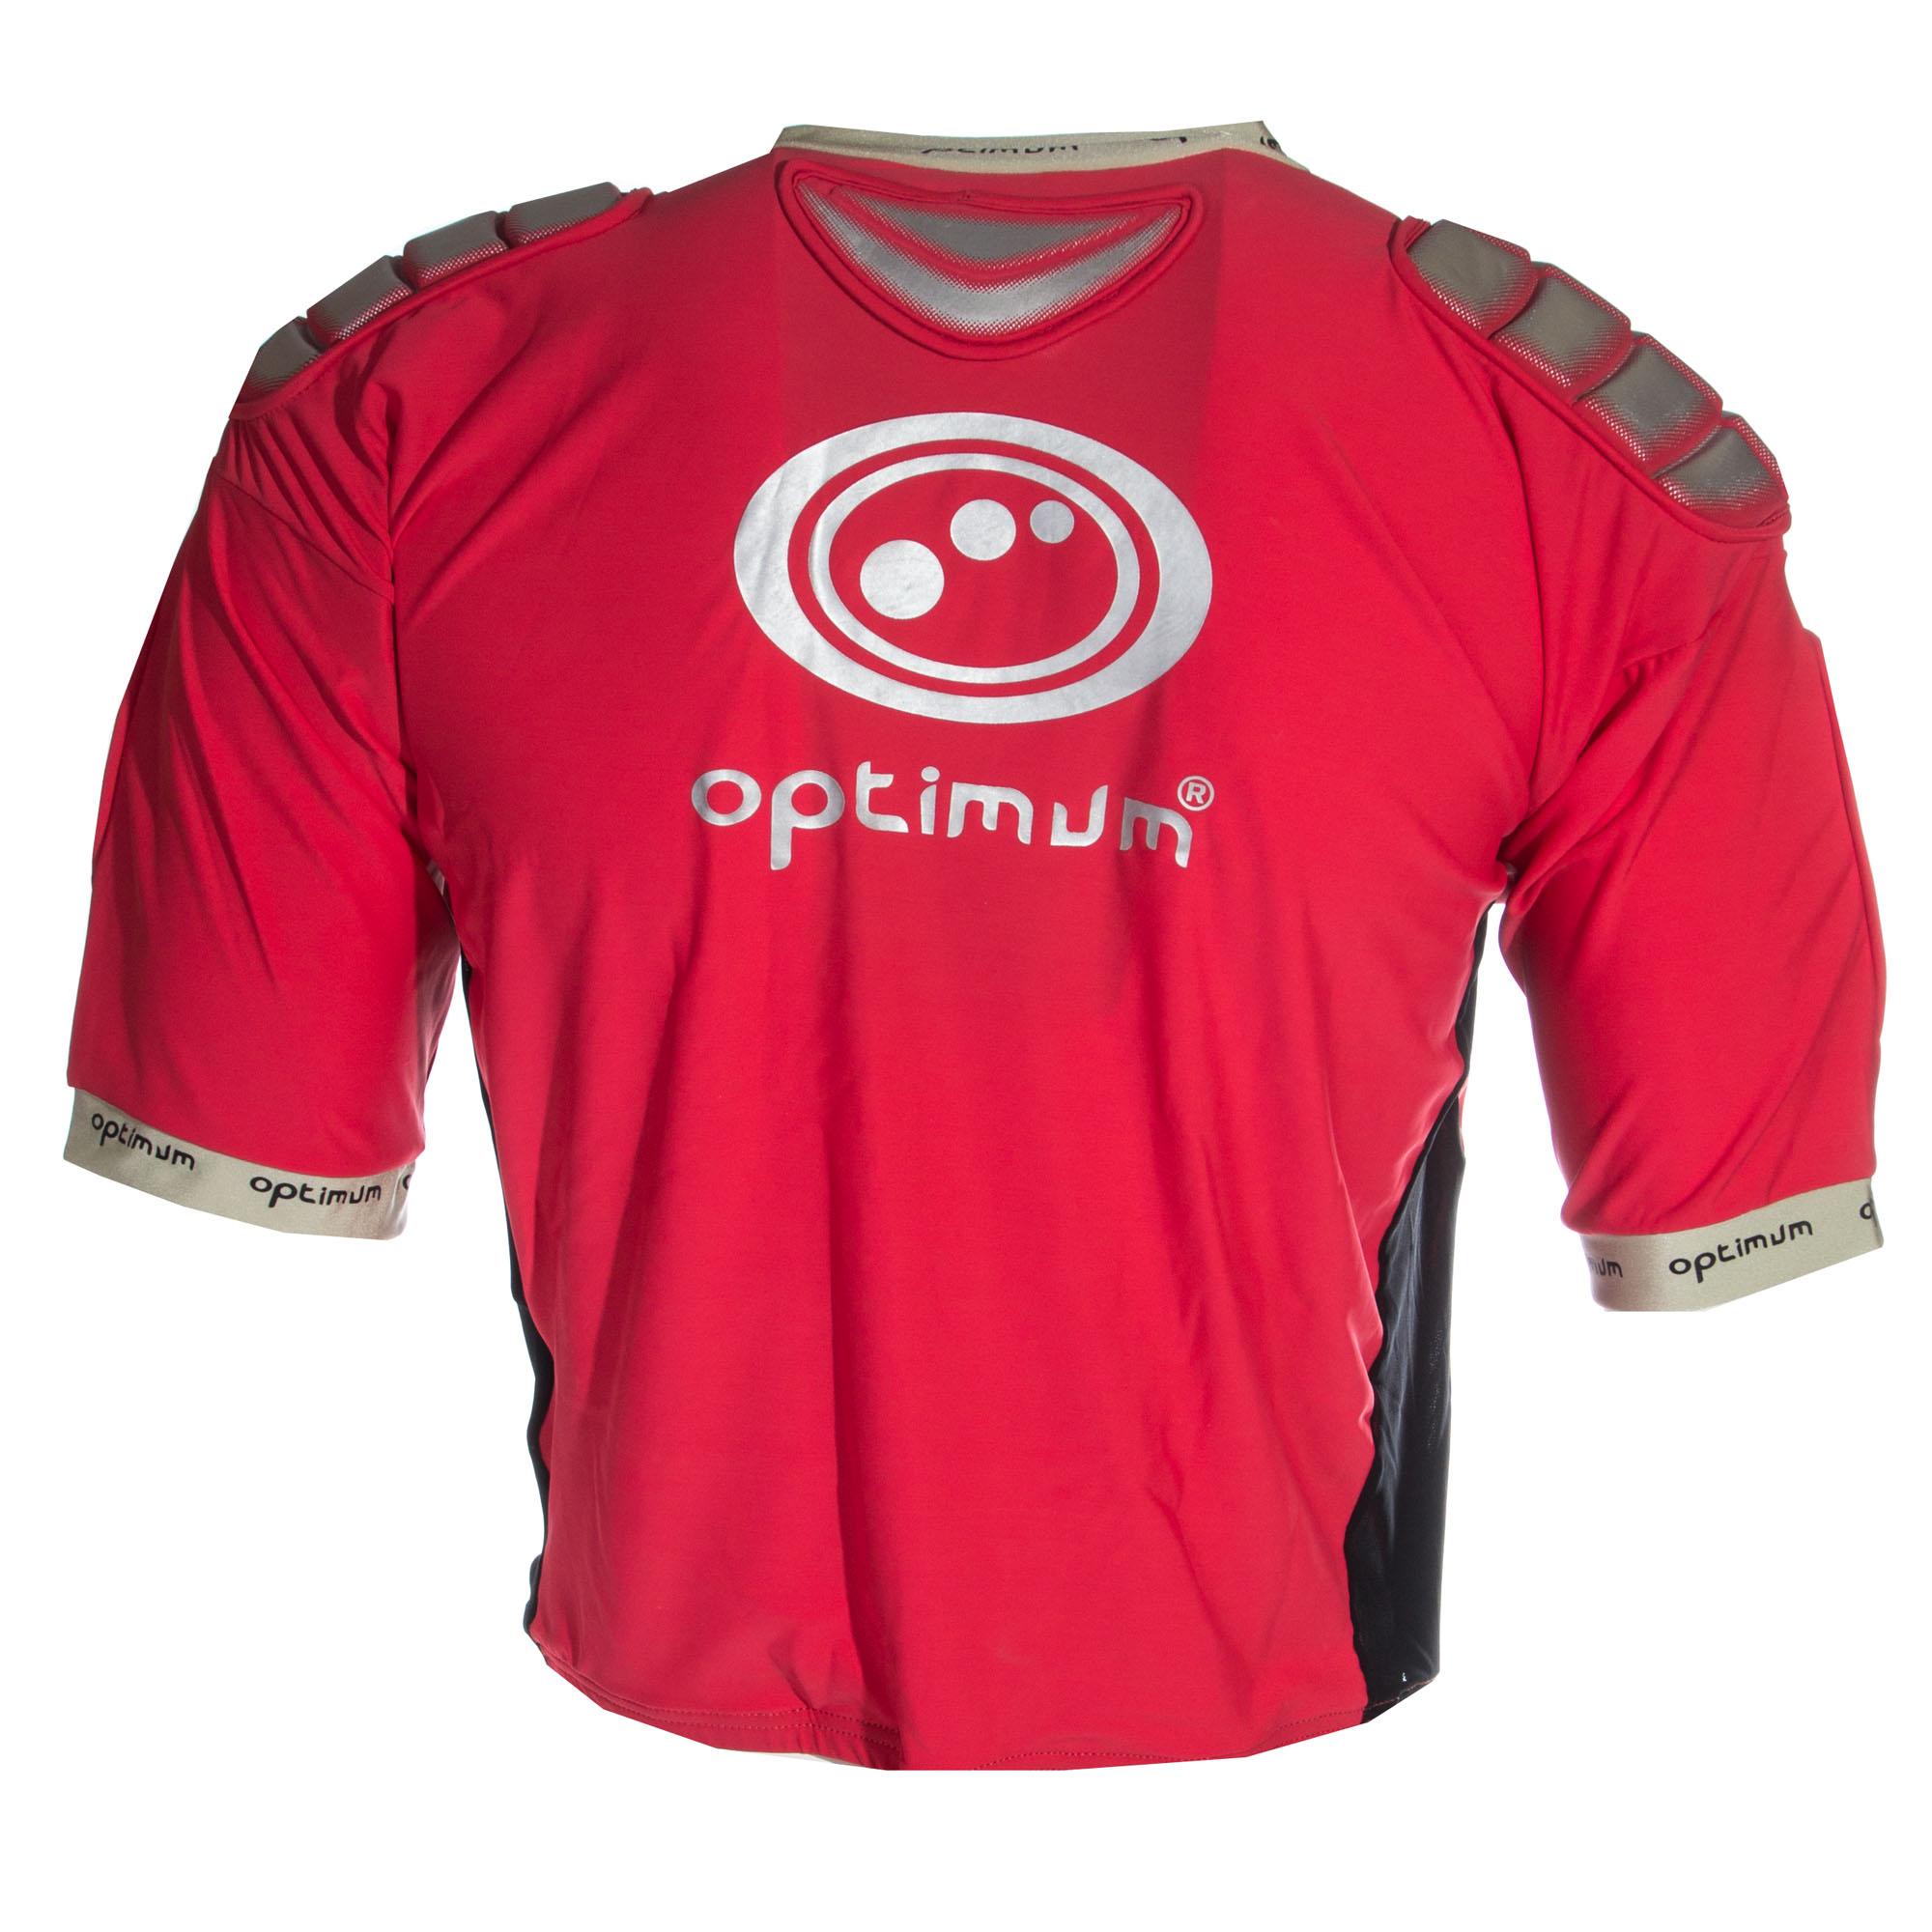 Optimum Origin Rugby Shoulder Pads